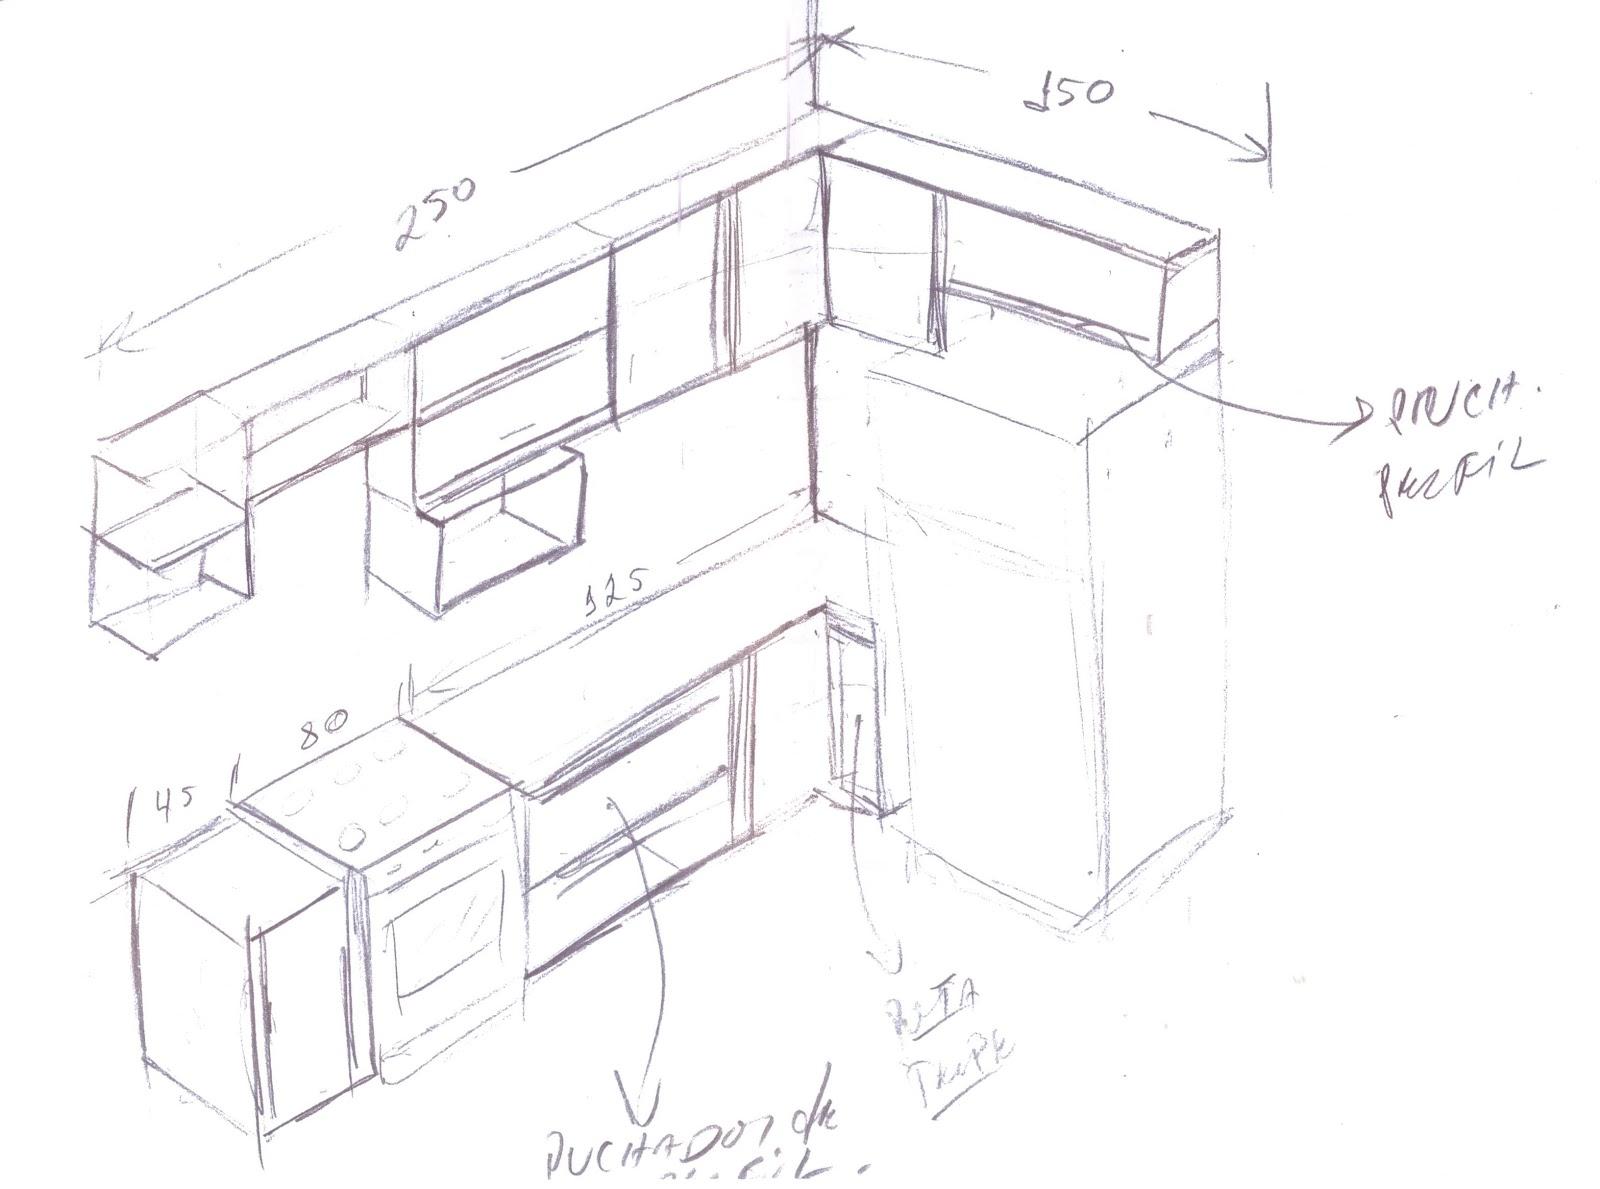 Cris A Dona da Casa!: Projeto Final da Cozinha #5A5A71 1600 1189